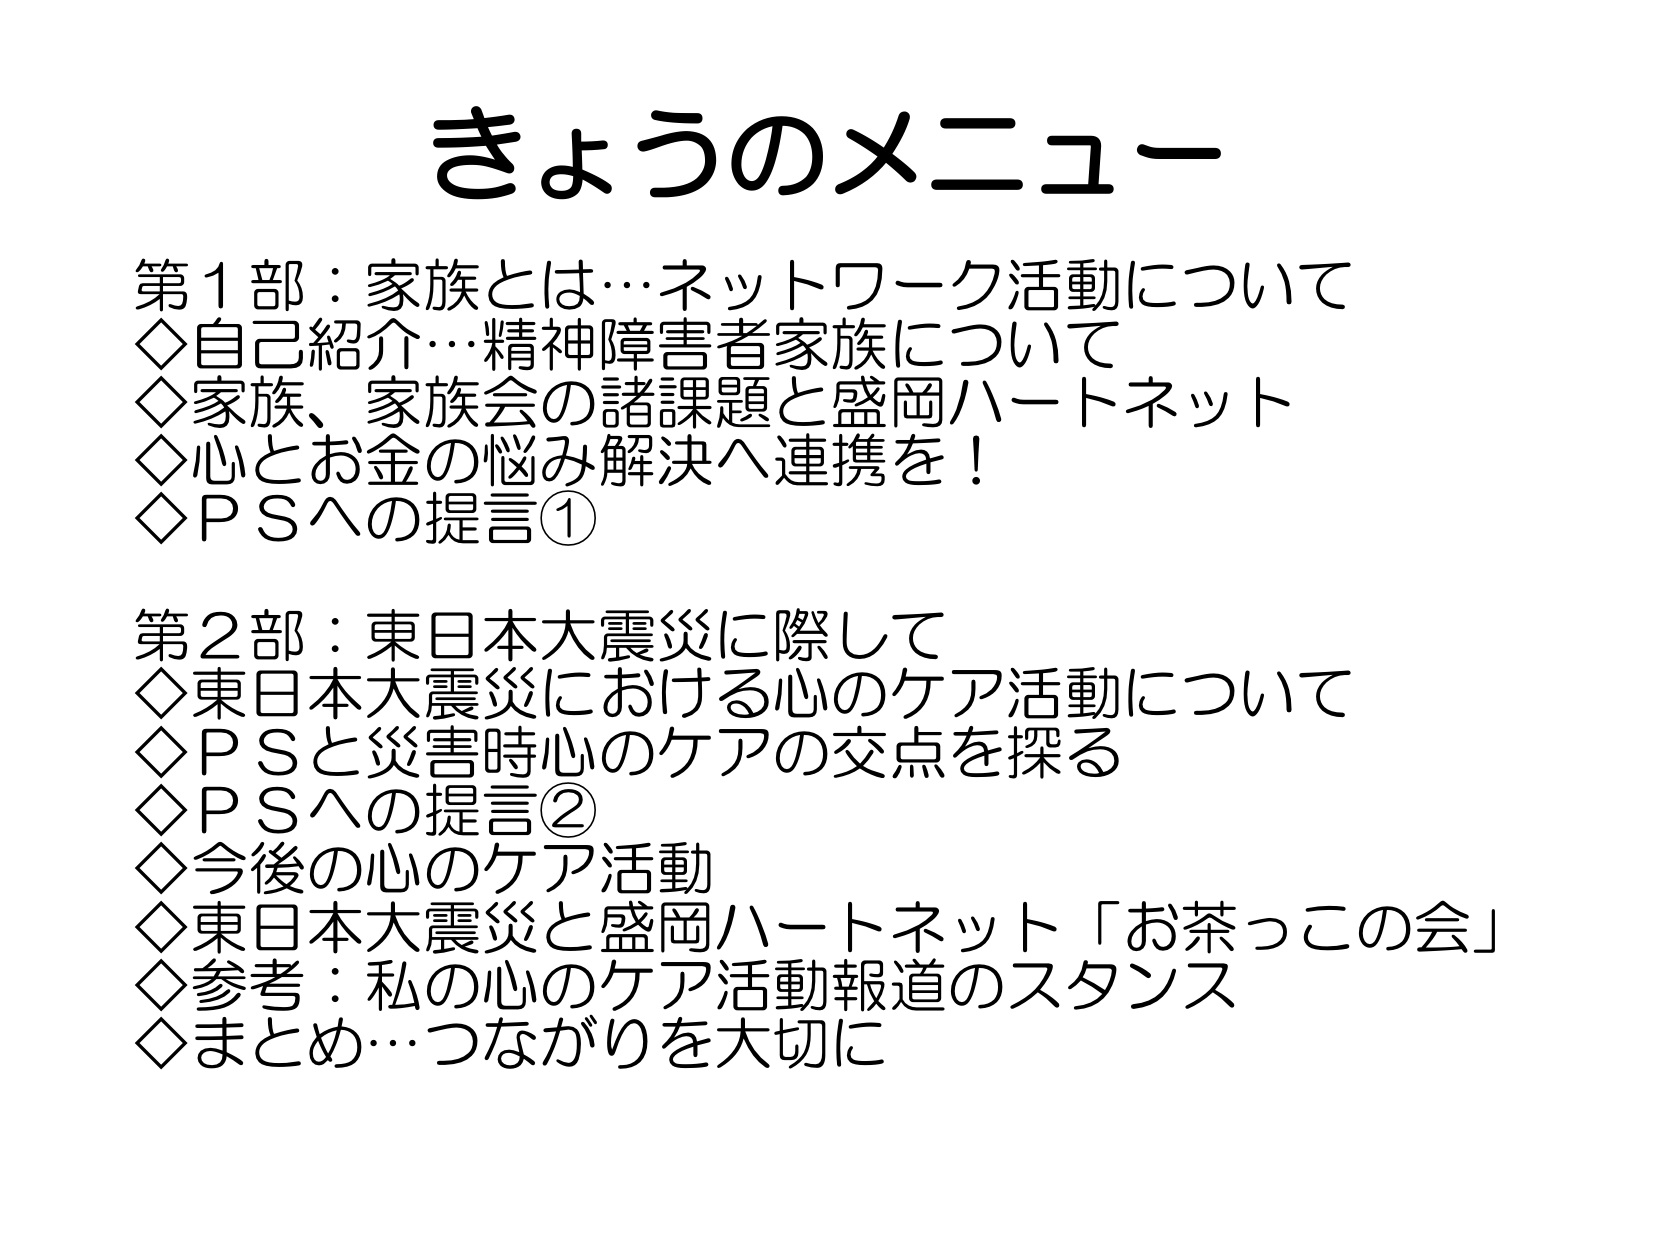 PS養成講座…パワーポイント資料①_a0103650_20374650.jpg